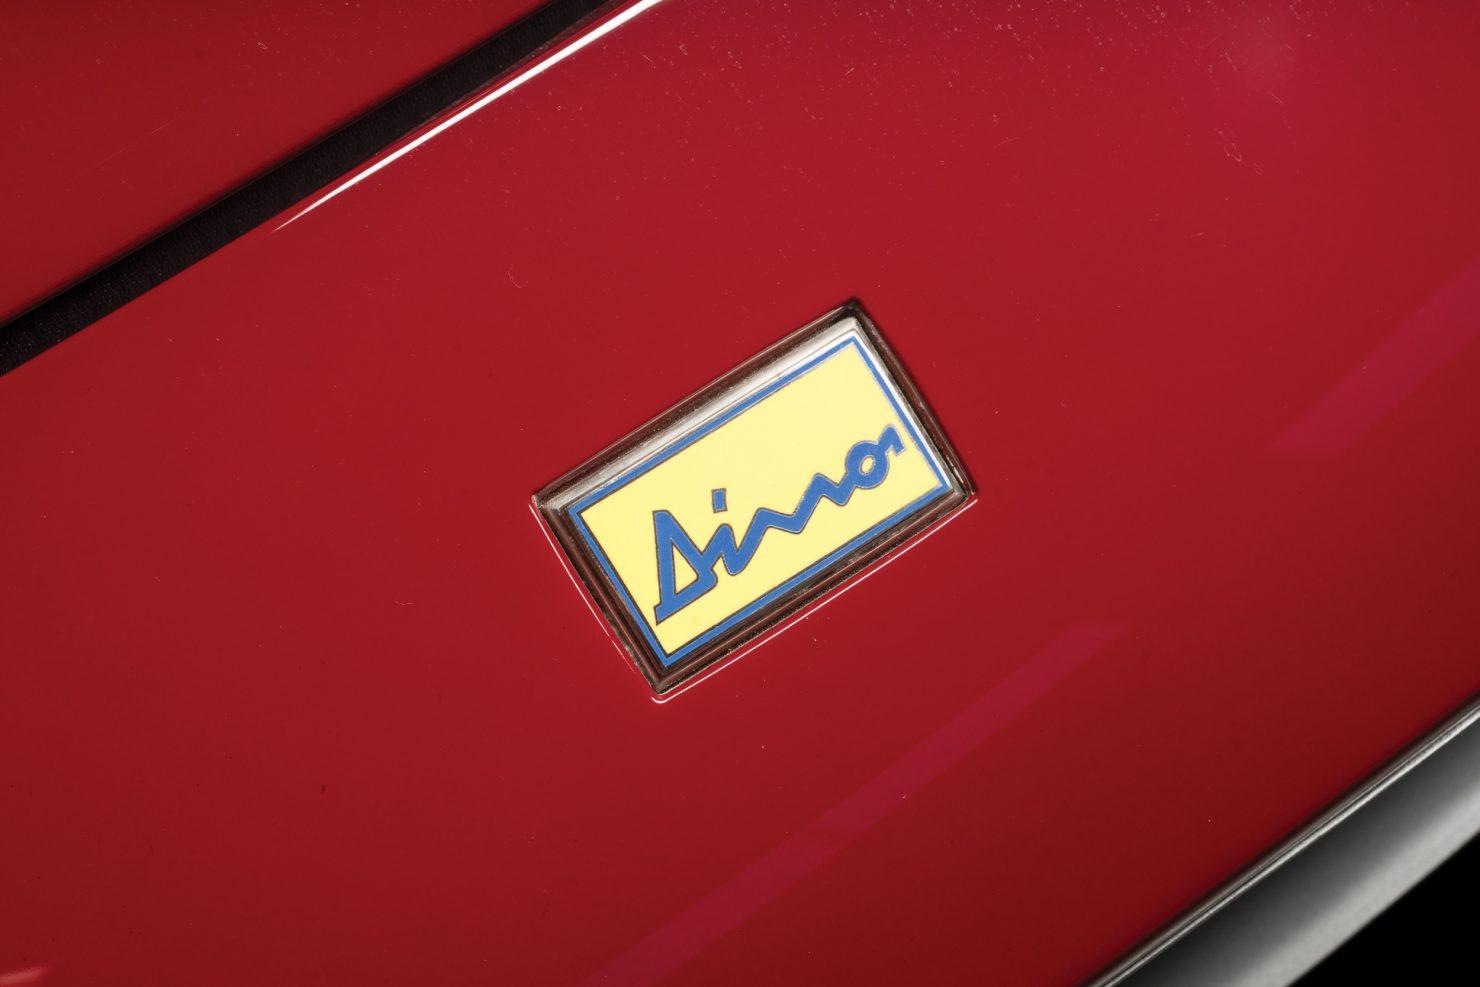 ferrari dino 246 6 1480x987 - 1969 Ferrari Dino 246 GT